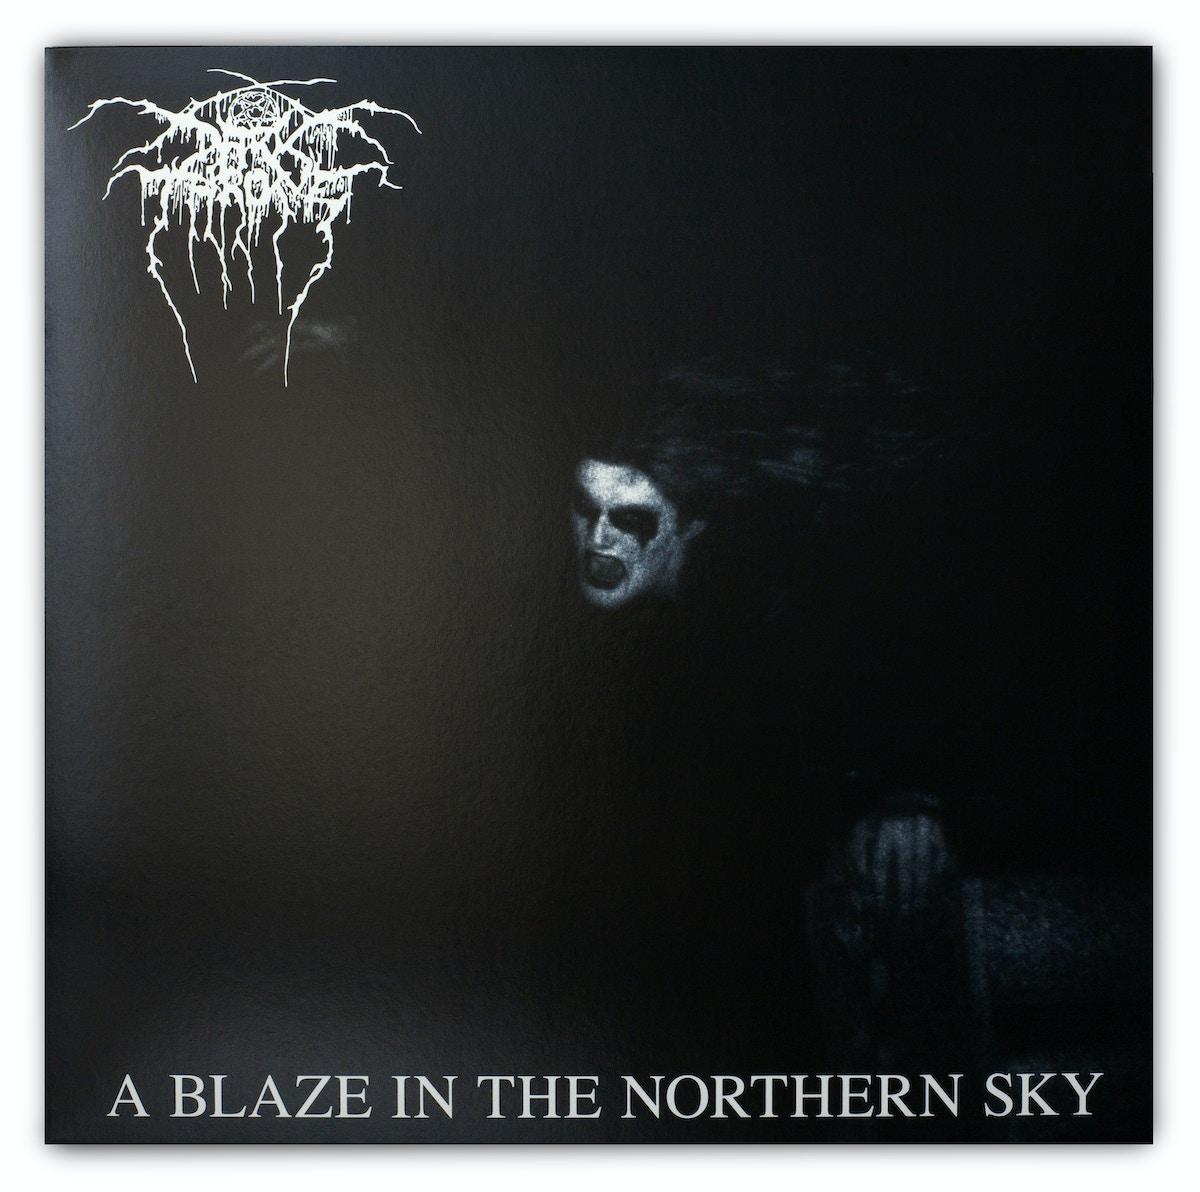 A vinyl record by Dark Throne